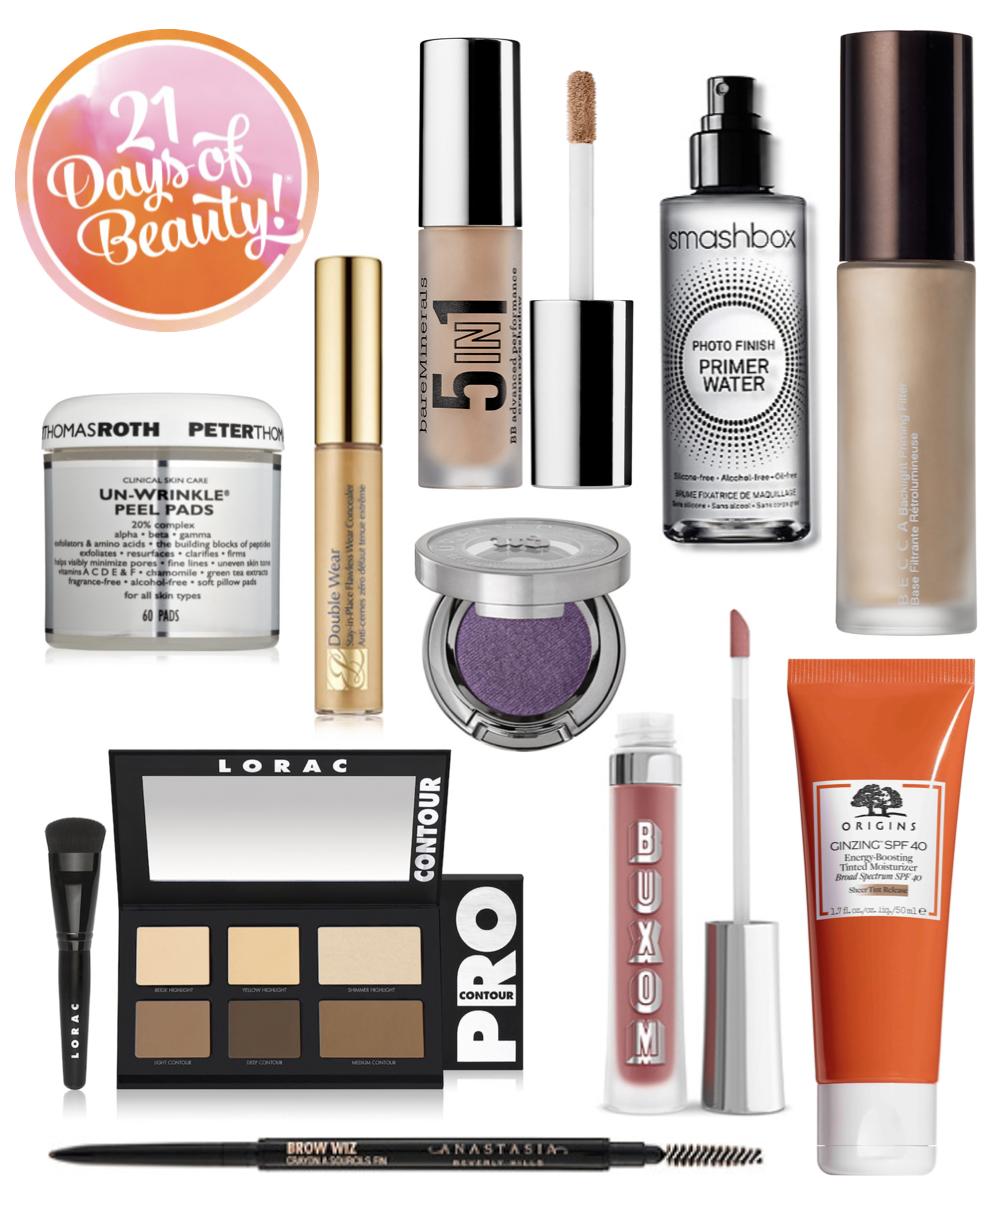 Best Buys Ulta 21 Days of Beauty March 2018